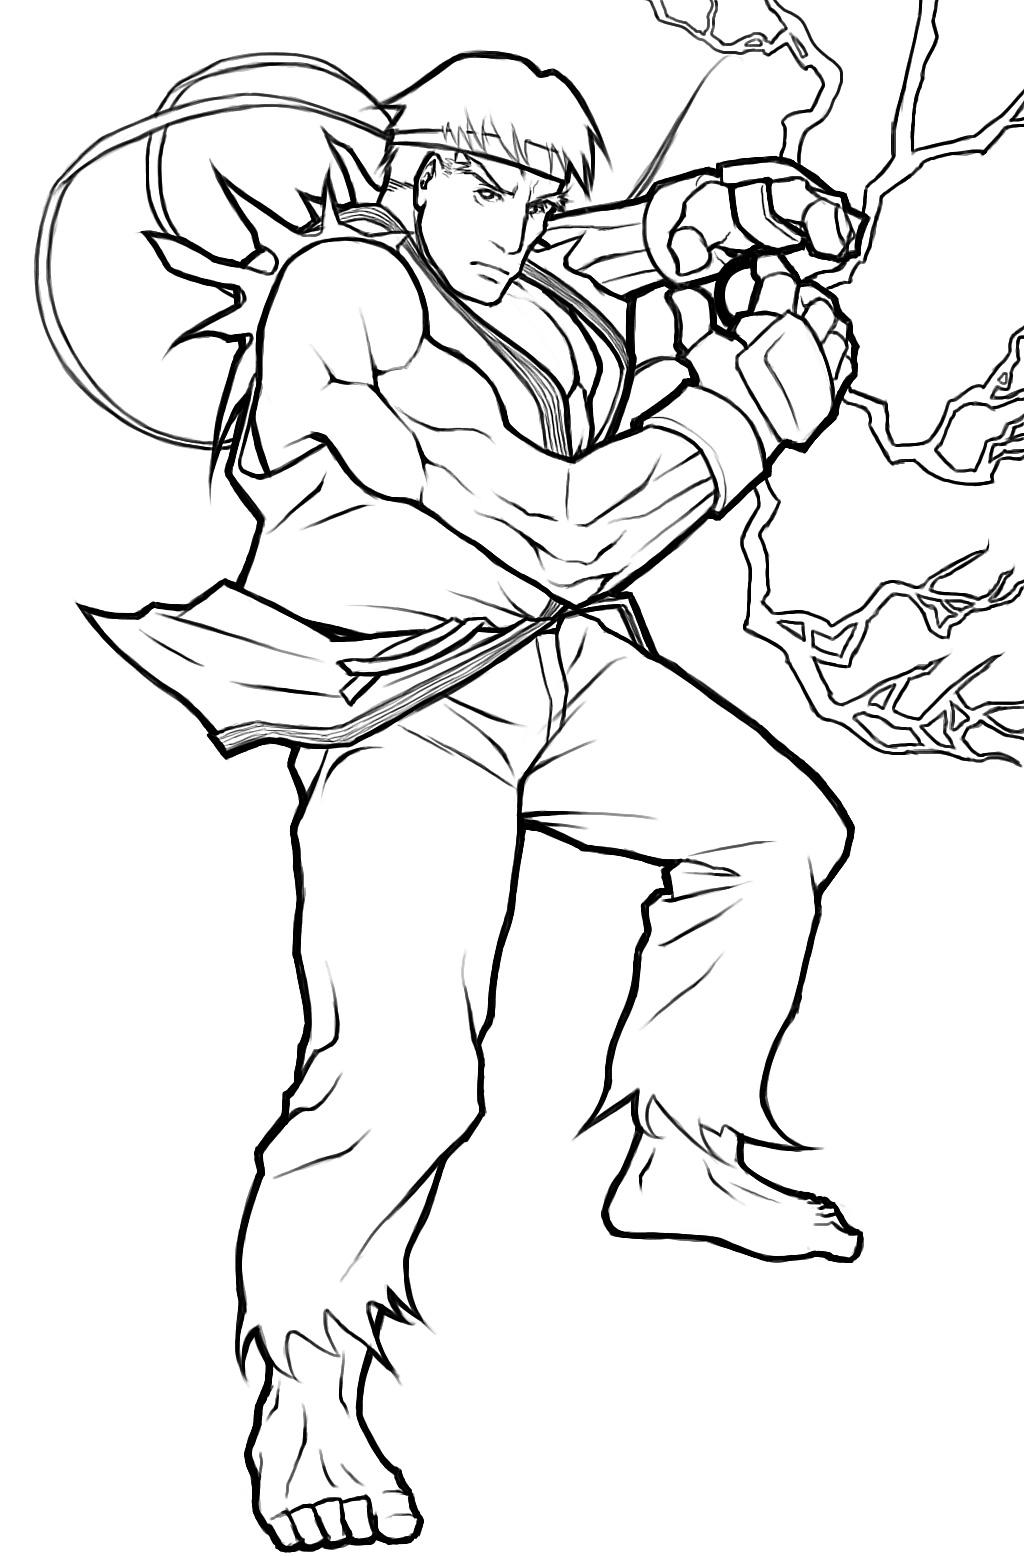 Ryu - Lineart